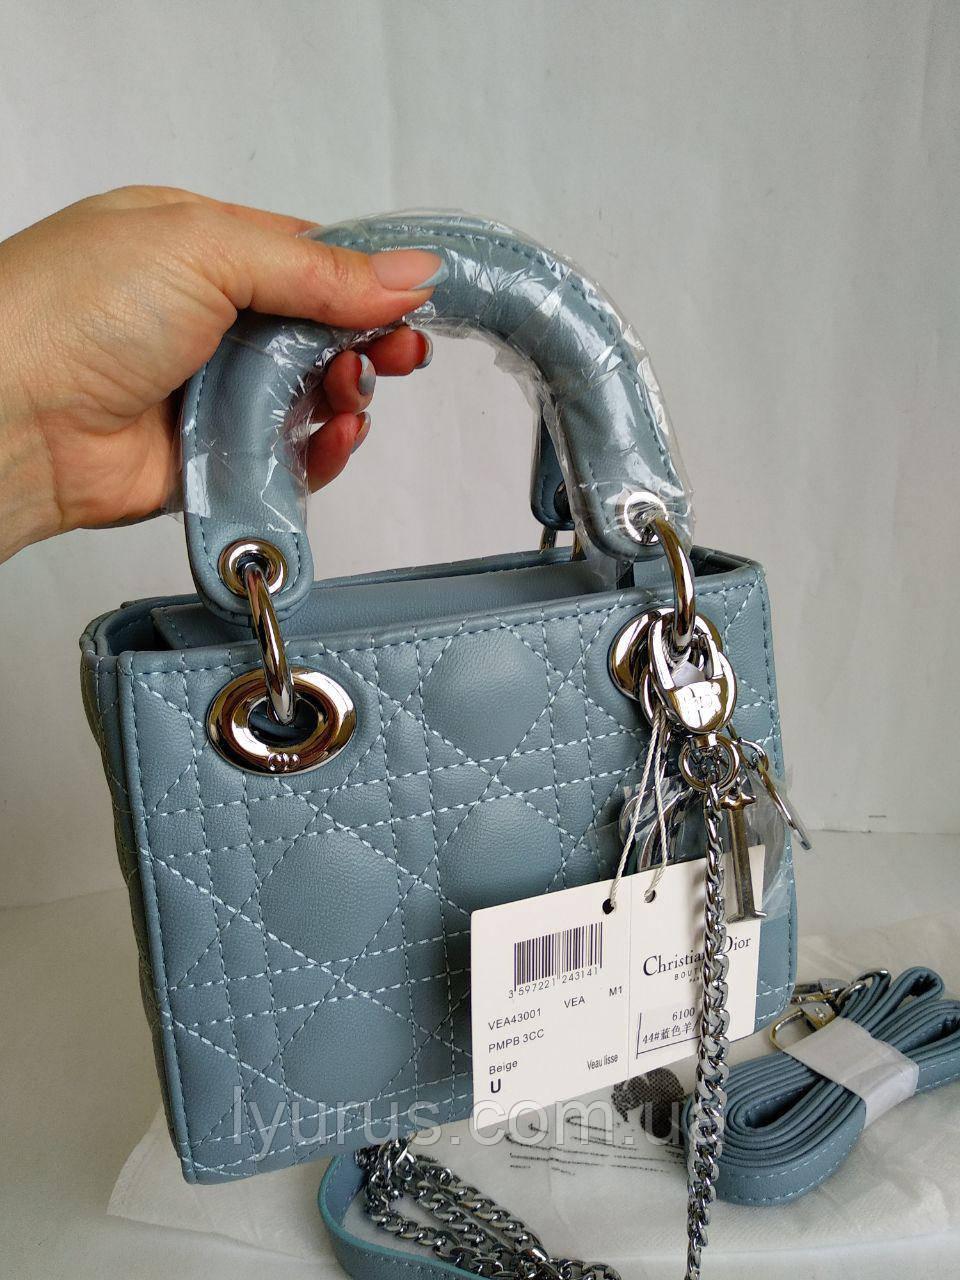 411a7098dafc Женская сумка в стиле Dior mini голубая: продажа, цена в Полтаве ...